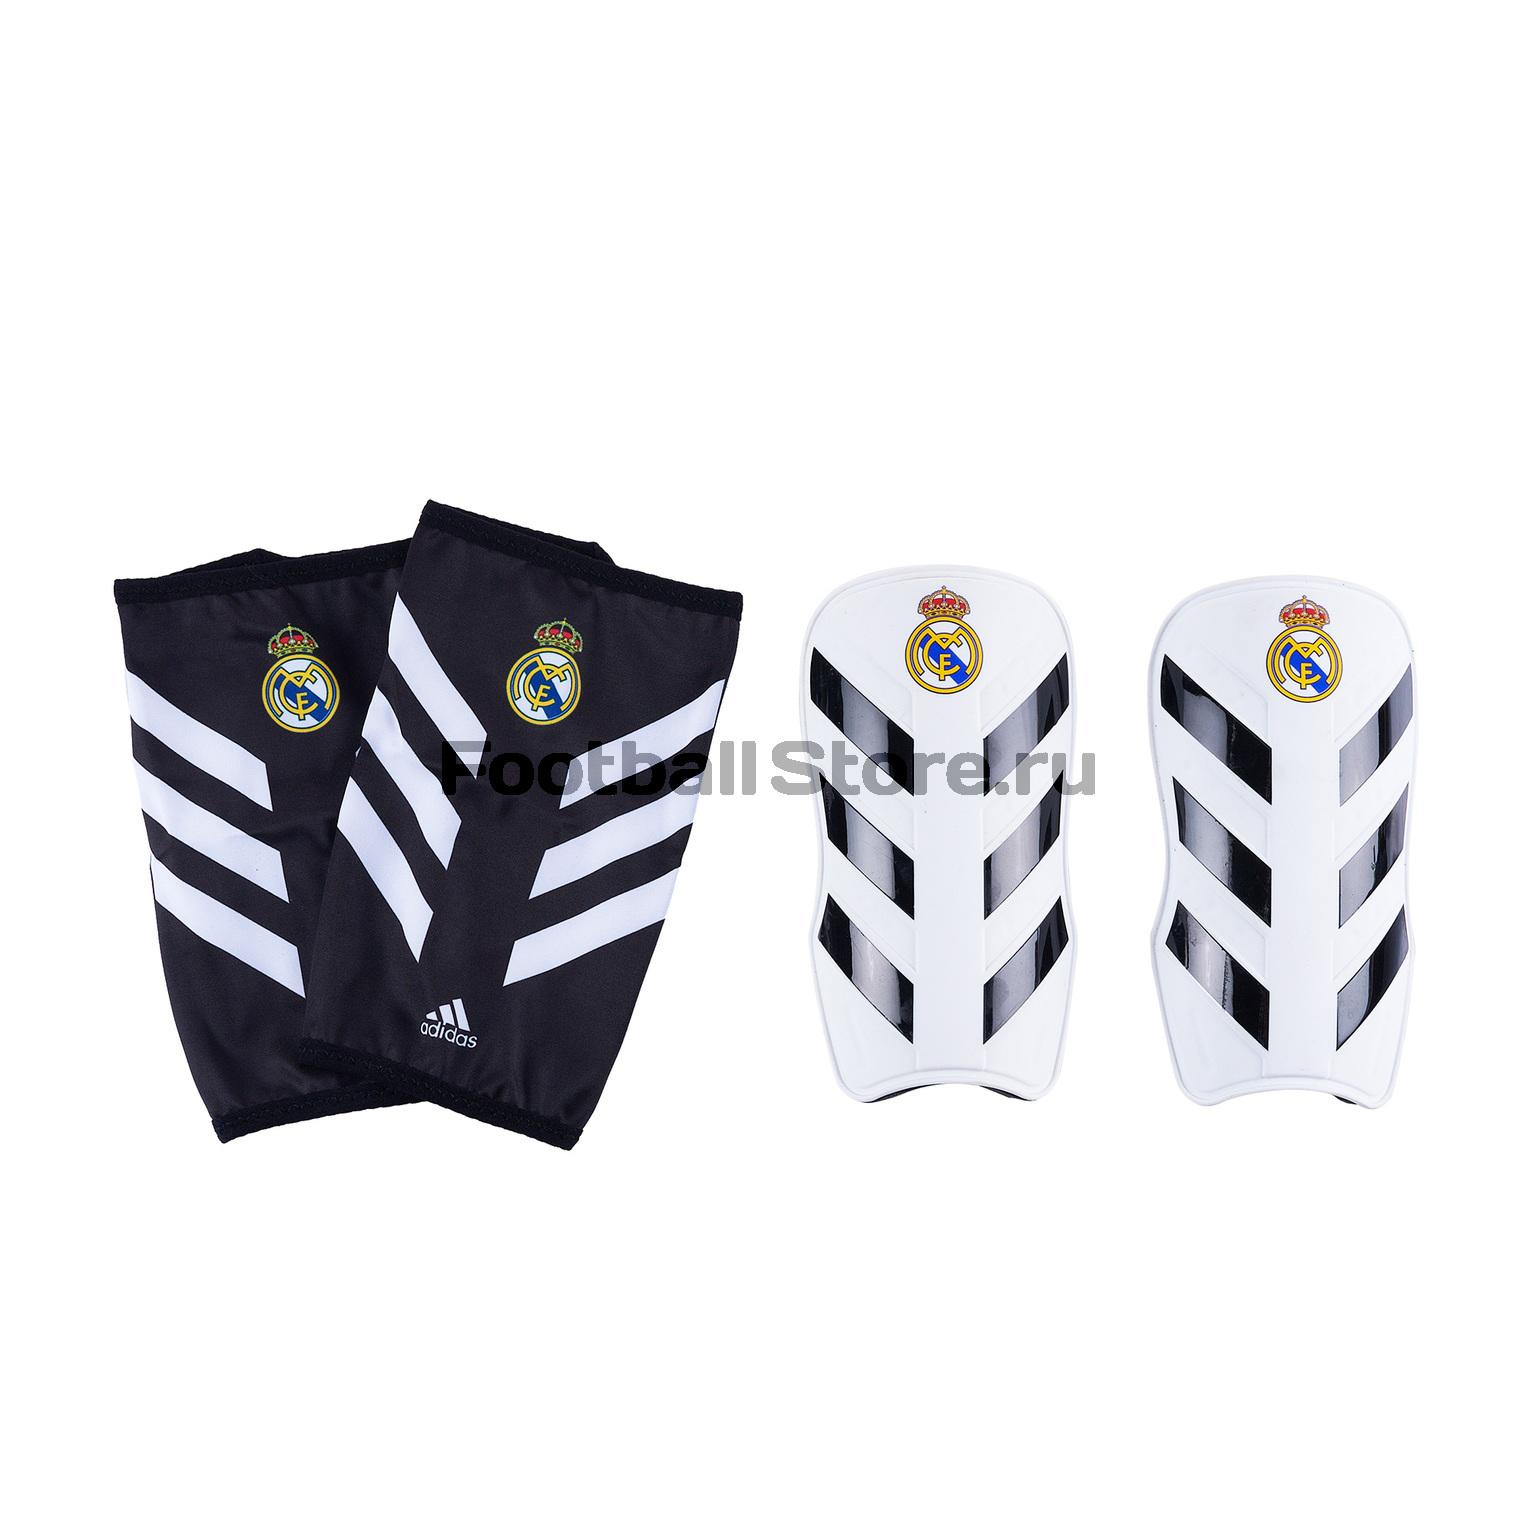 Щитки Adidas Real Madrid Pro Lite CW9701 футболка стрэйч printio реал мадрид